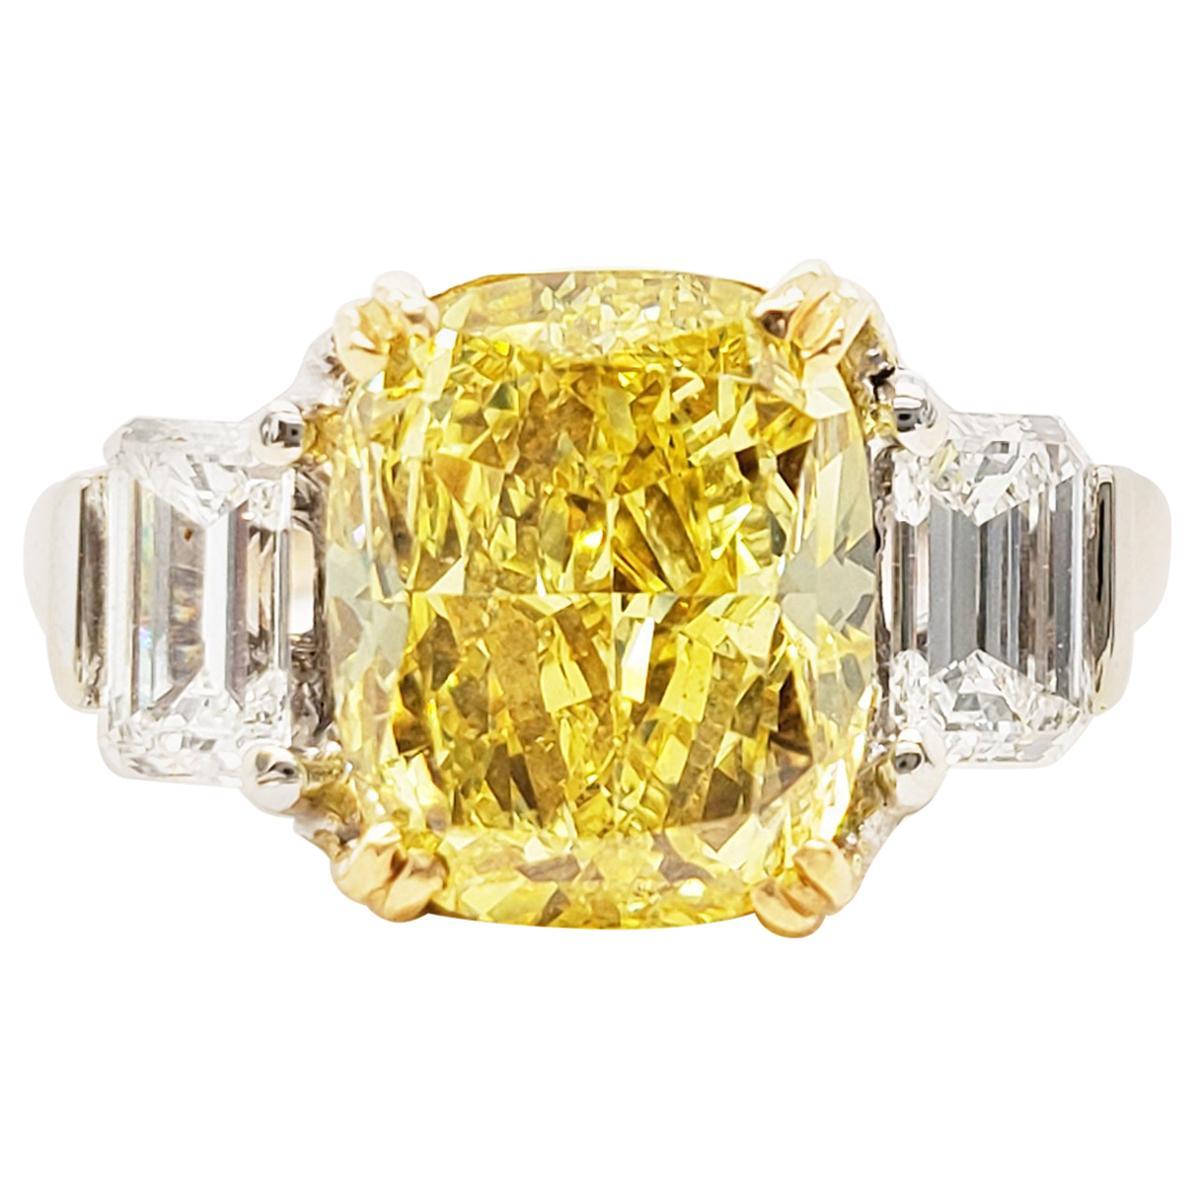 Scarselli 4 Carats Fancy Vivid Yellow Cushion Diamond Ring in Platinum 'GIA'